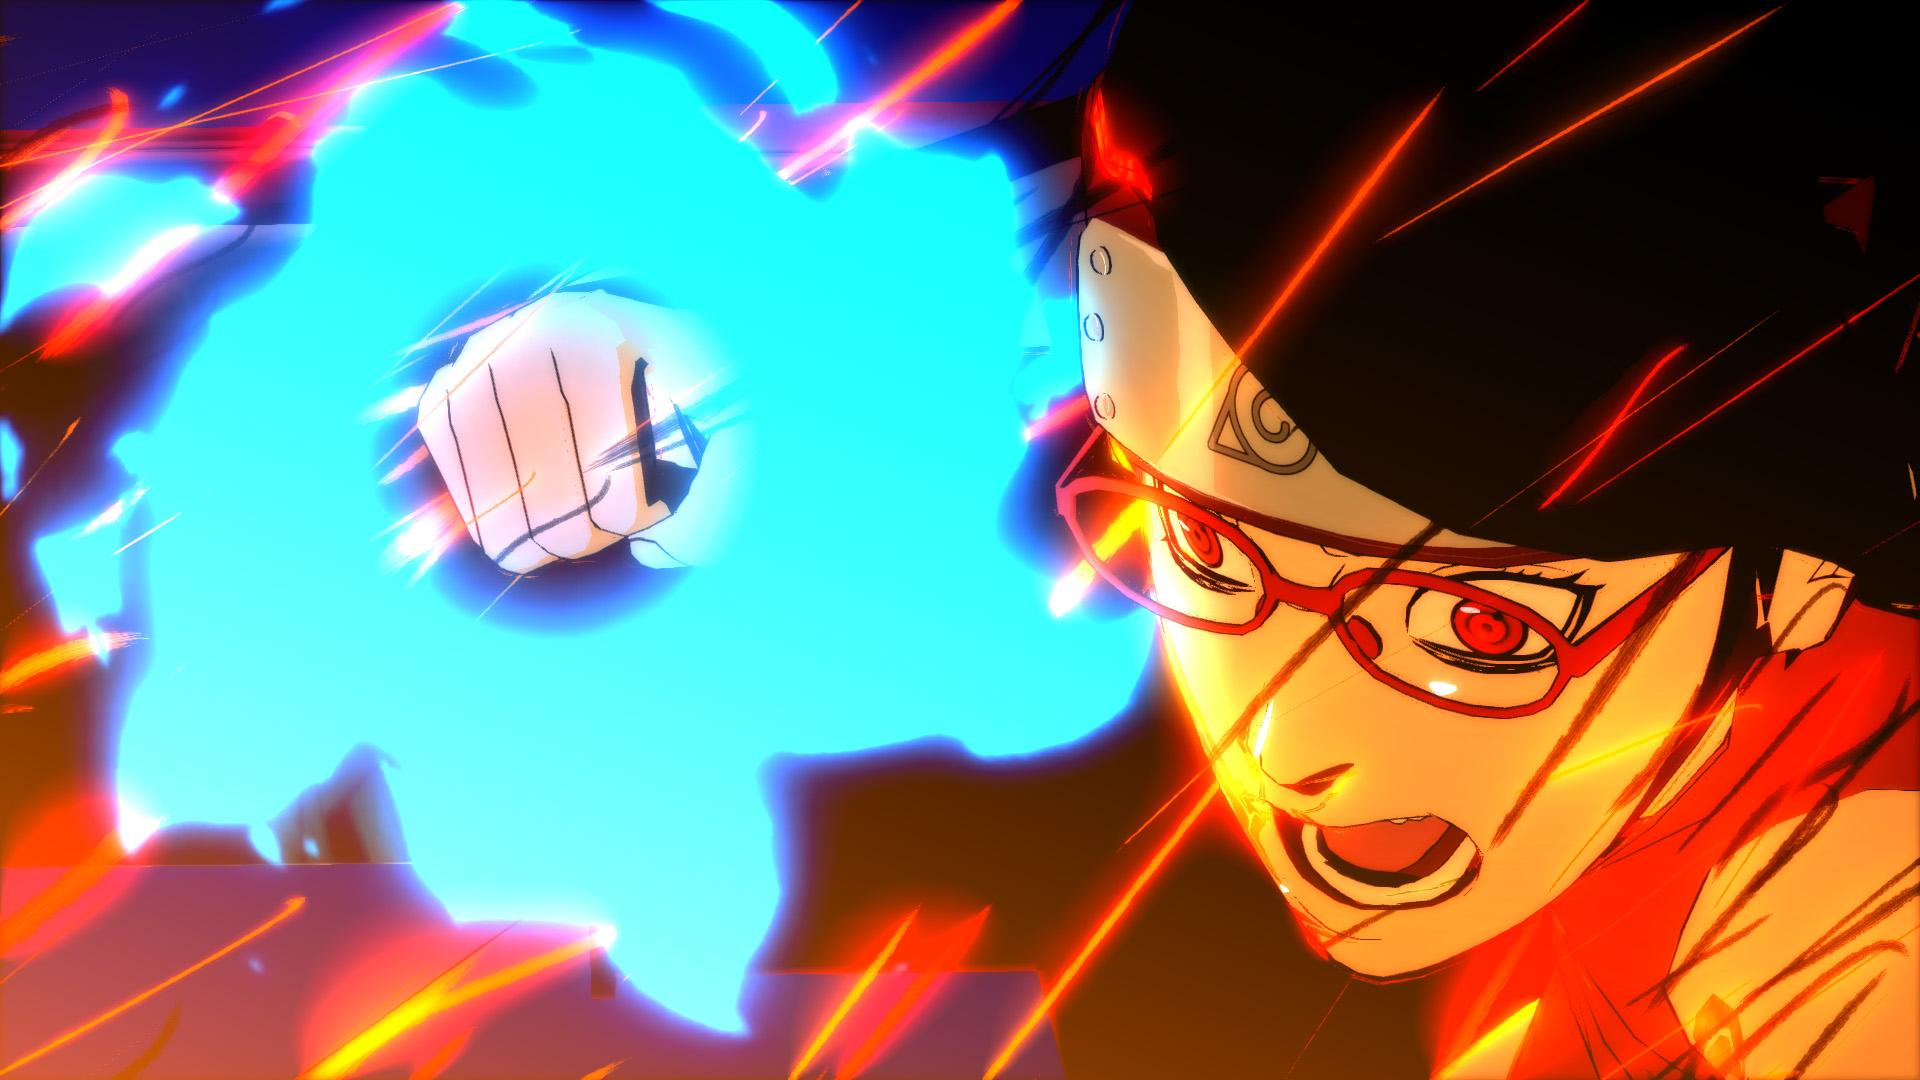 Скриншот №2 к NARUTO SHIPPUDEN Ultimate Ninja STORM 4 Road to Boruto